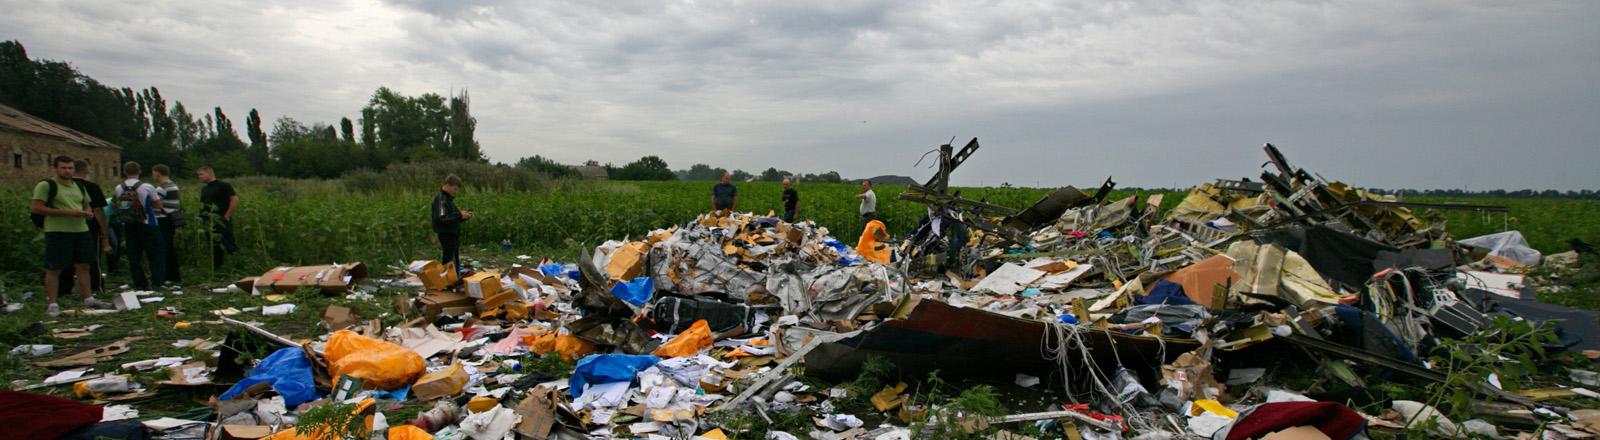 Trümmer des Flugzeugs MH17